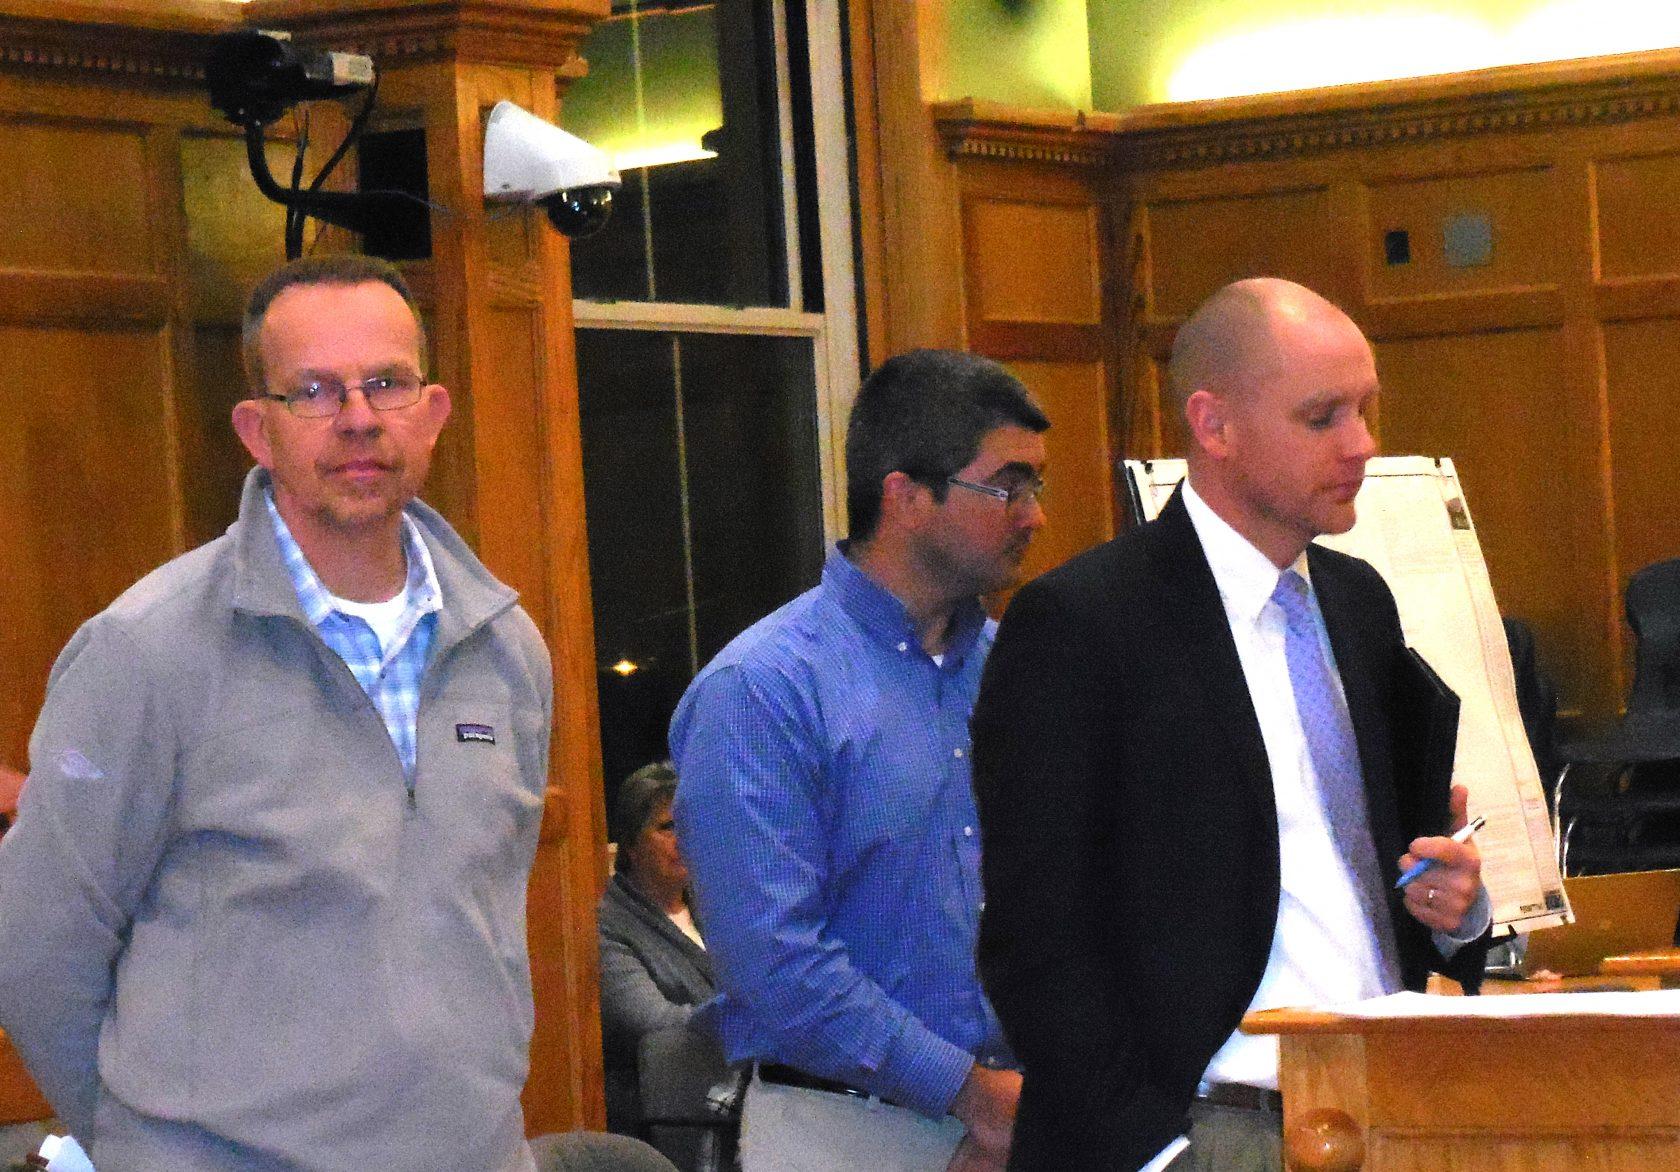 Boise Cascade seeks operation change at public hearing